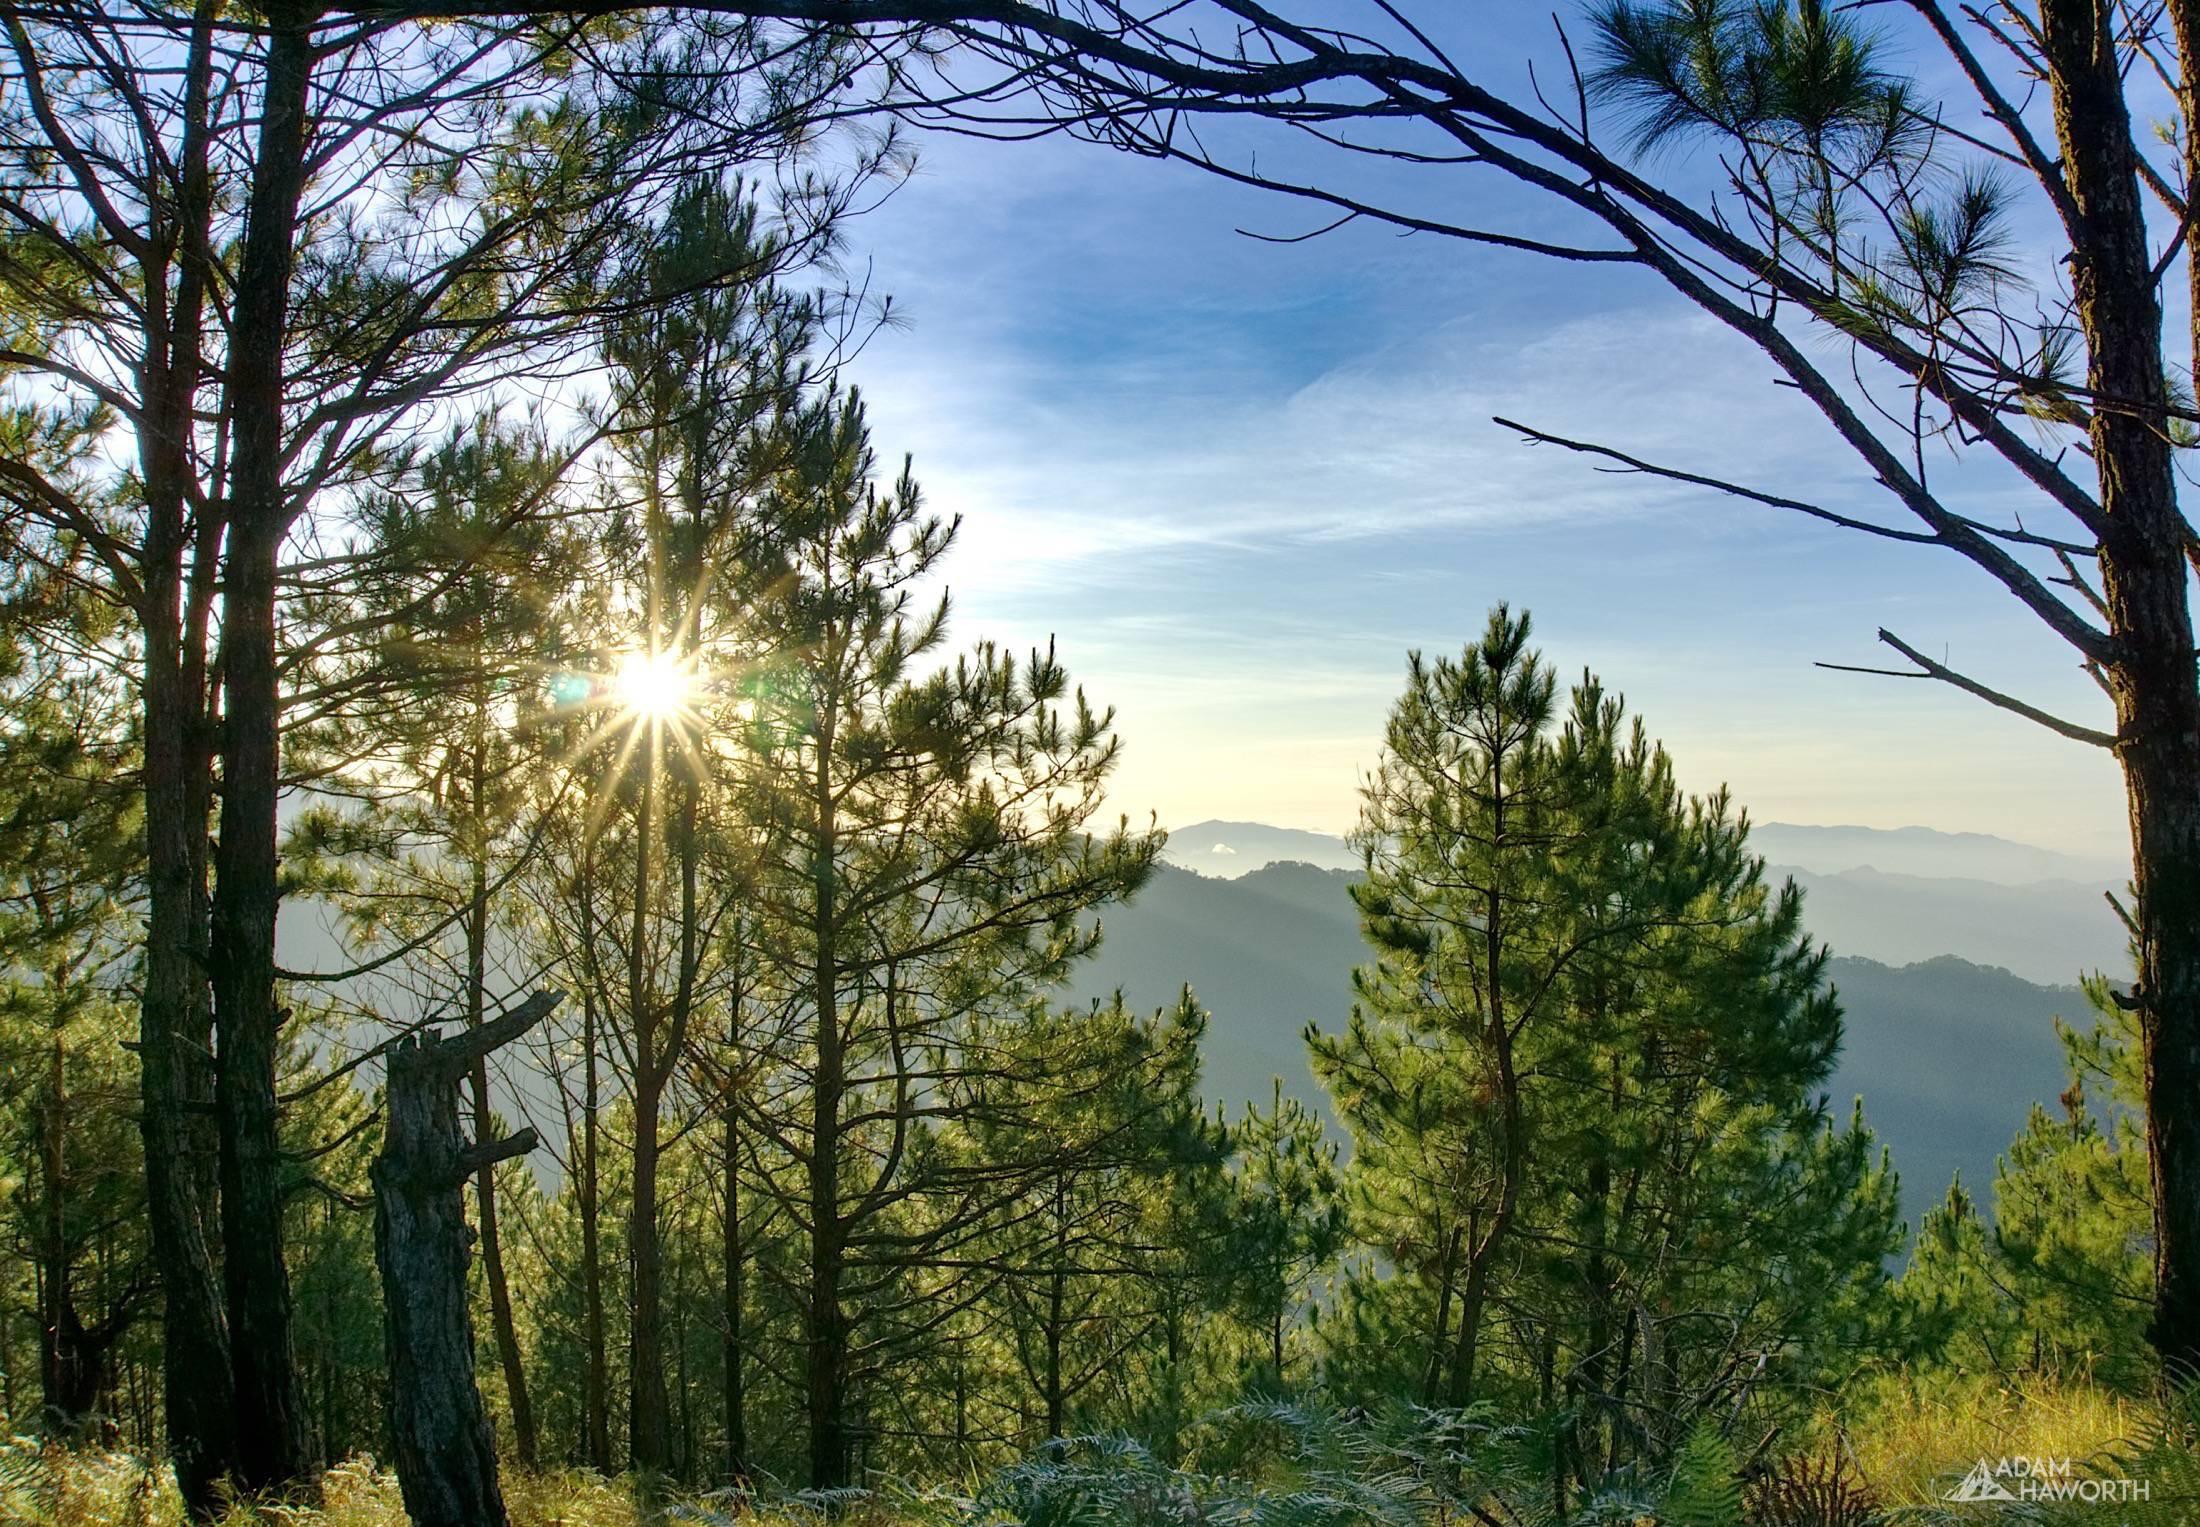 Adam Haworth Mt Ulap Photography